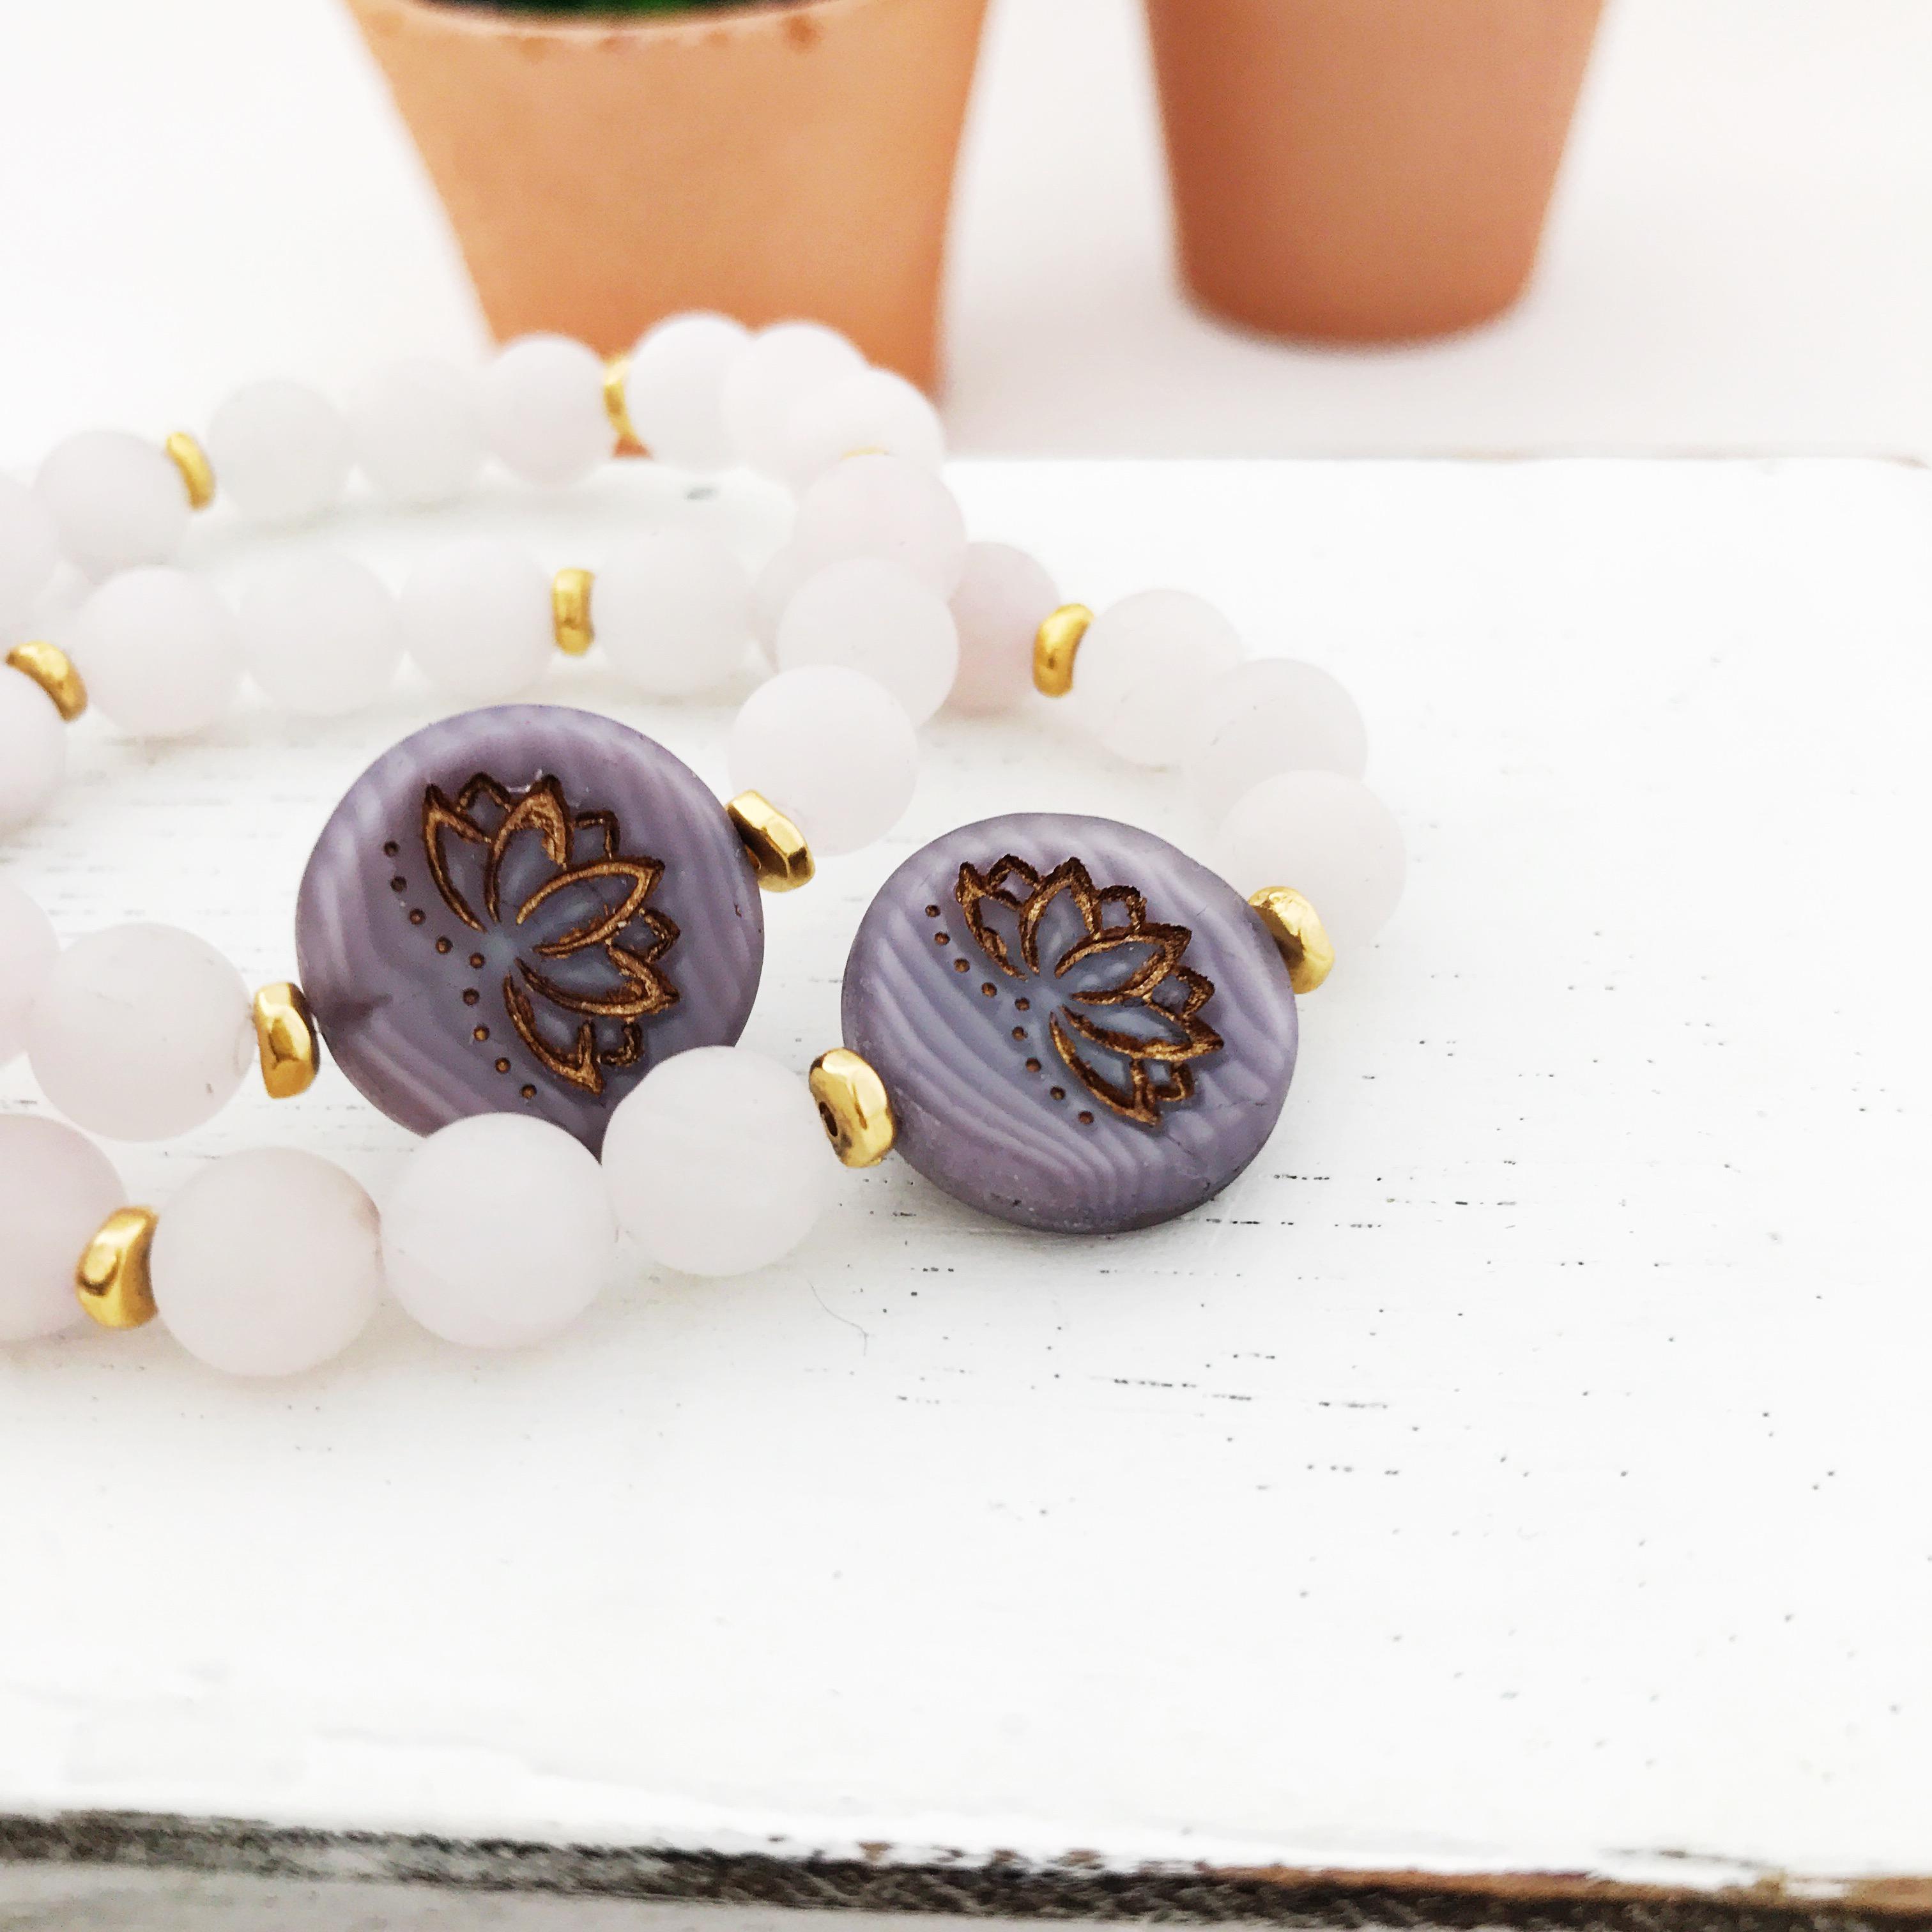 Rose Quartz Matte Gemstones Lotus Flower Healing Stretch Bracelet Meditation Yoga From The Onyx Feather